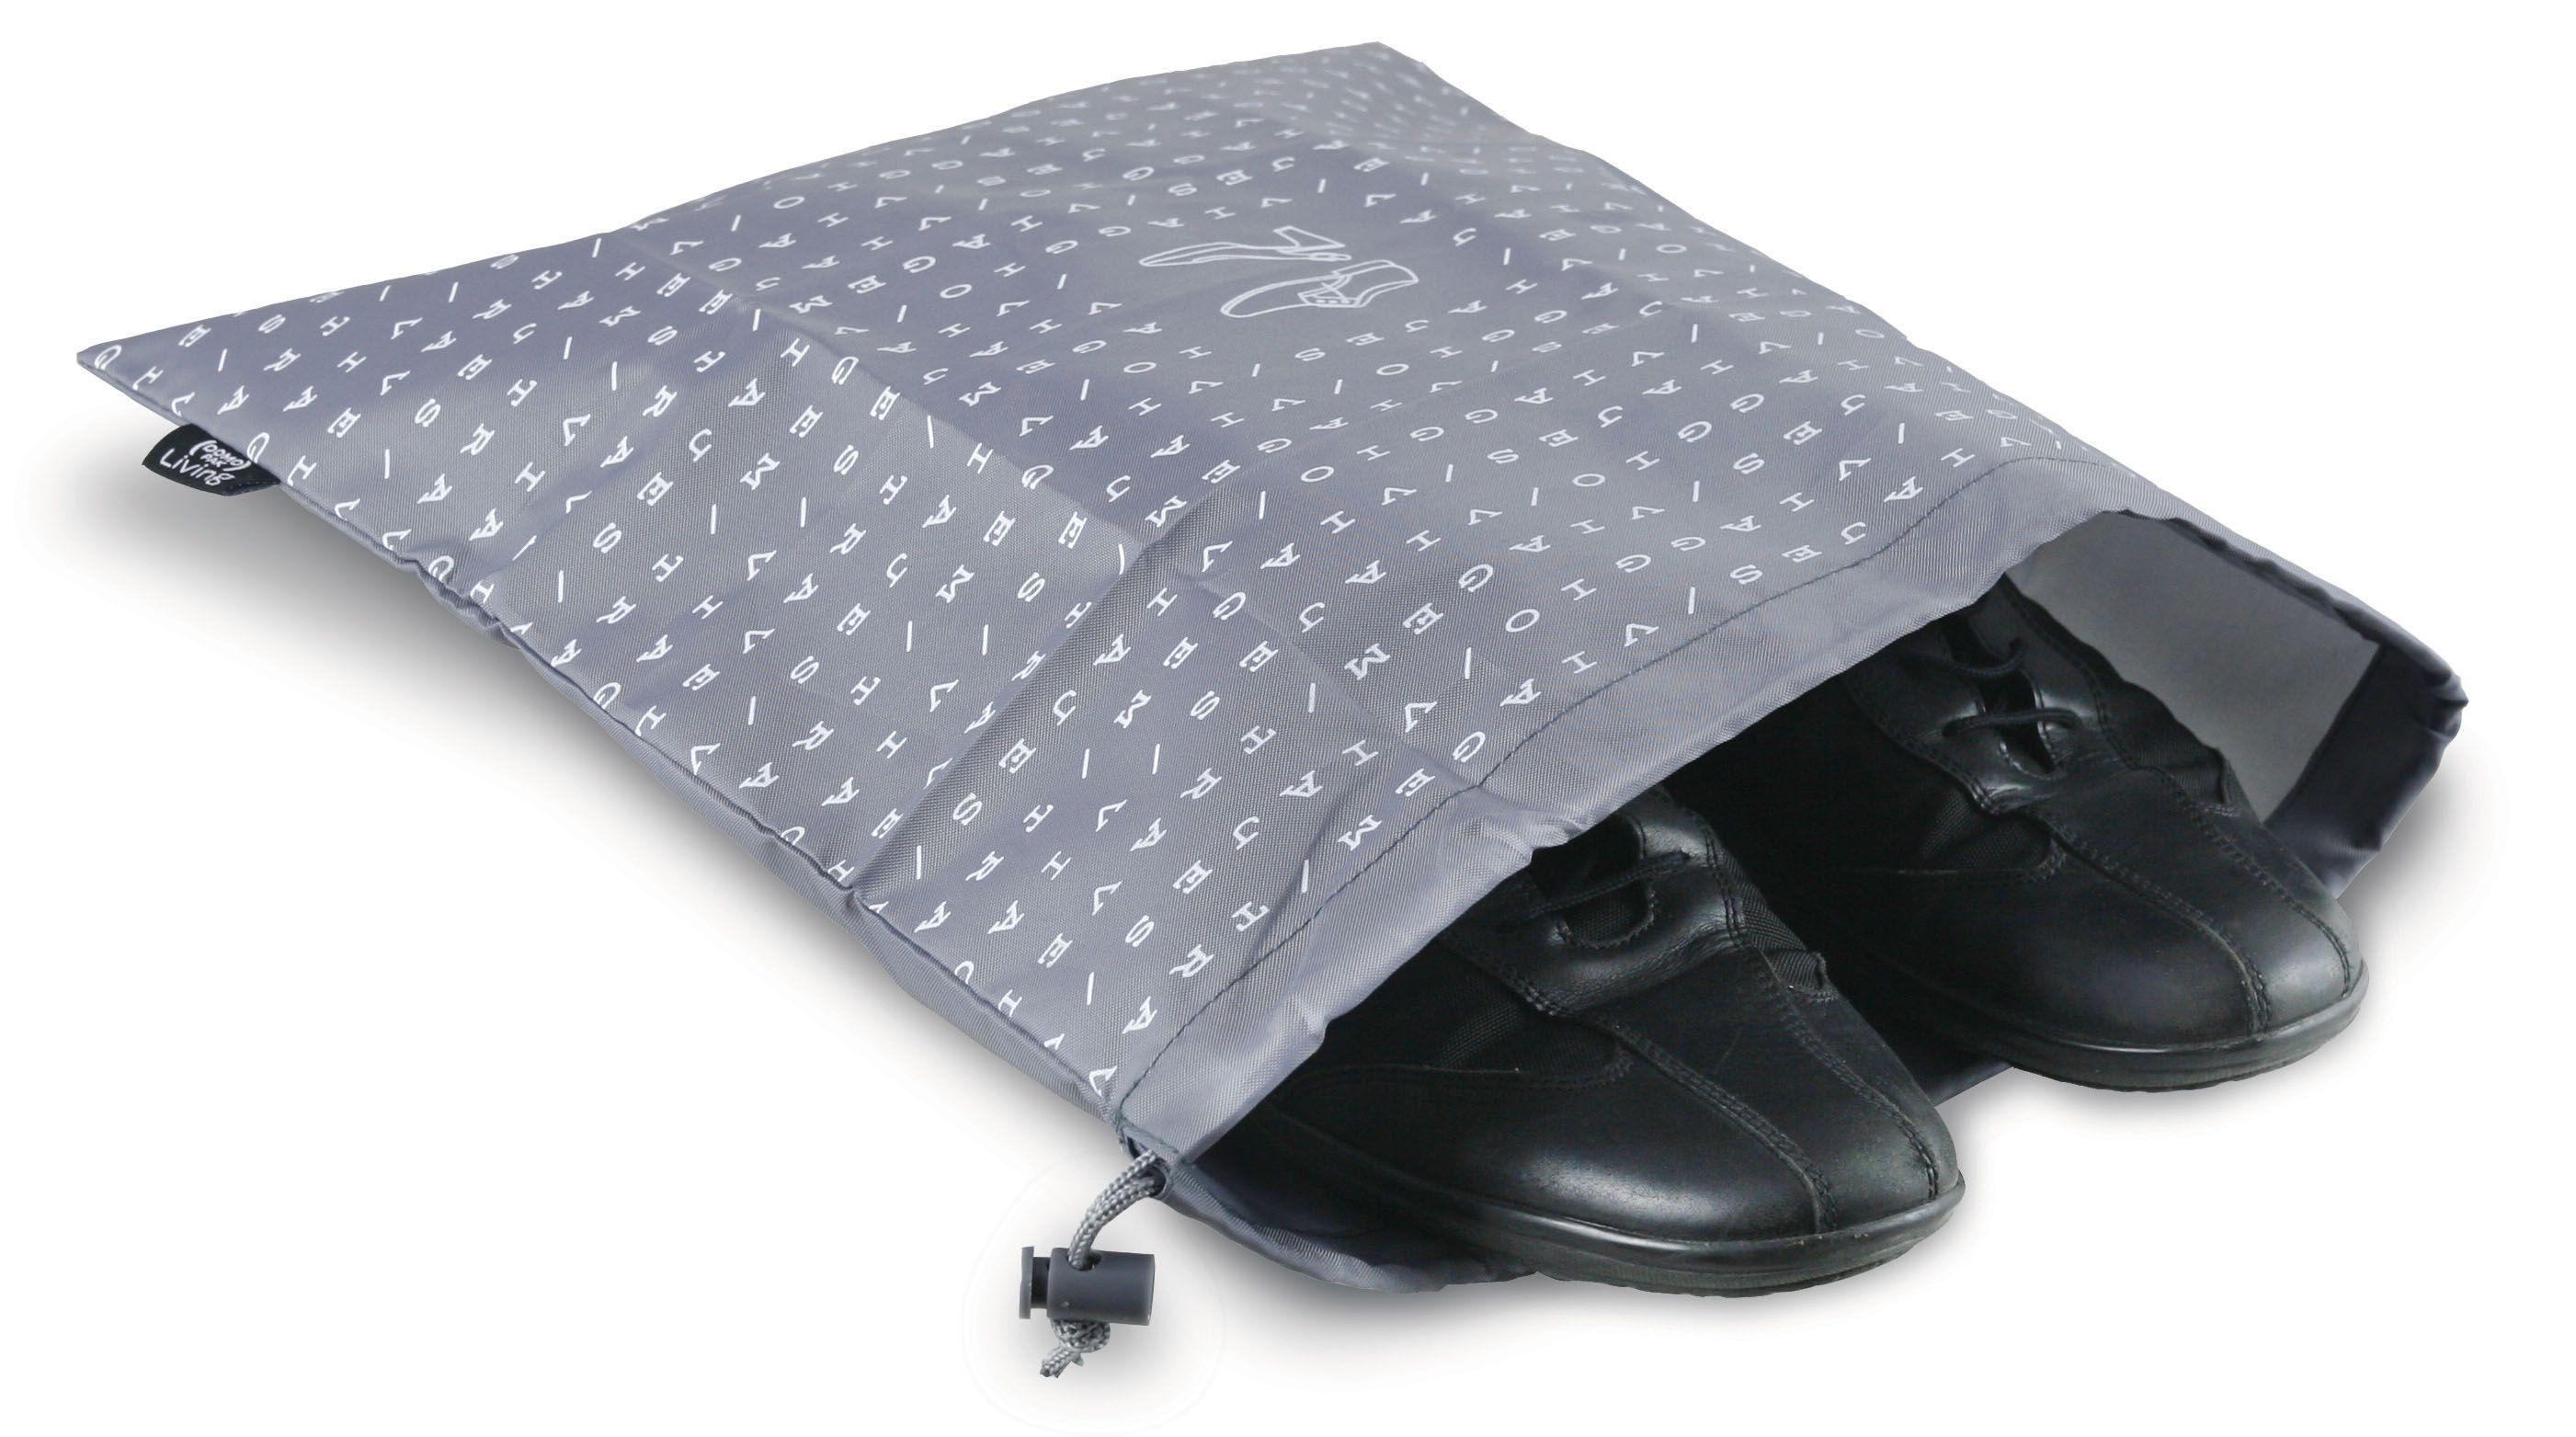 Husa textila pentru incaltaminte, Sach Gri, L40xl36 cm poza